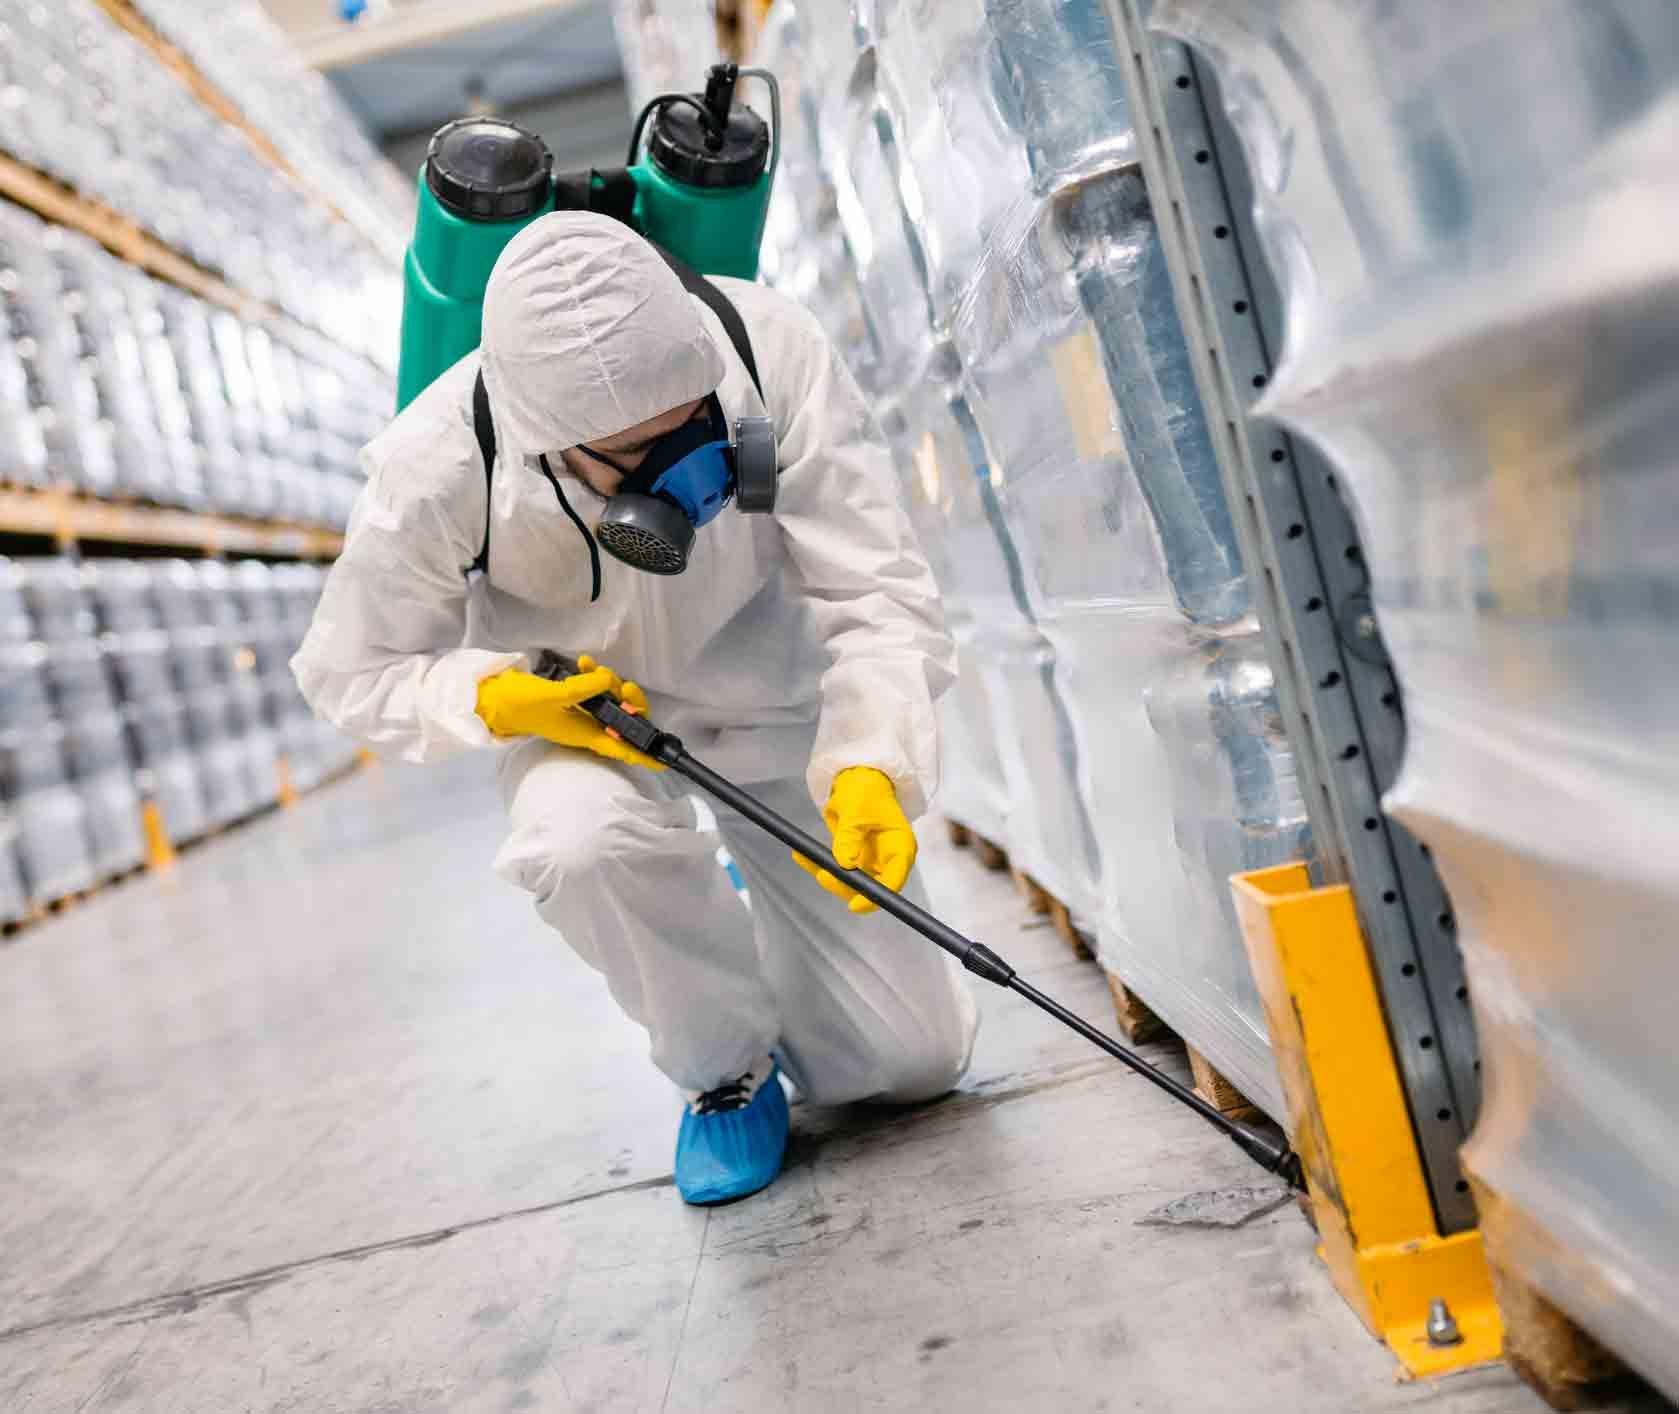 Warehouse Pest Control Best Practices